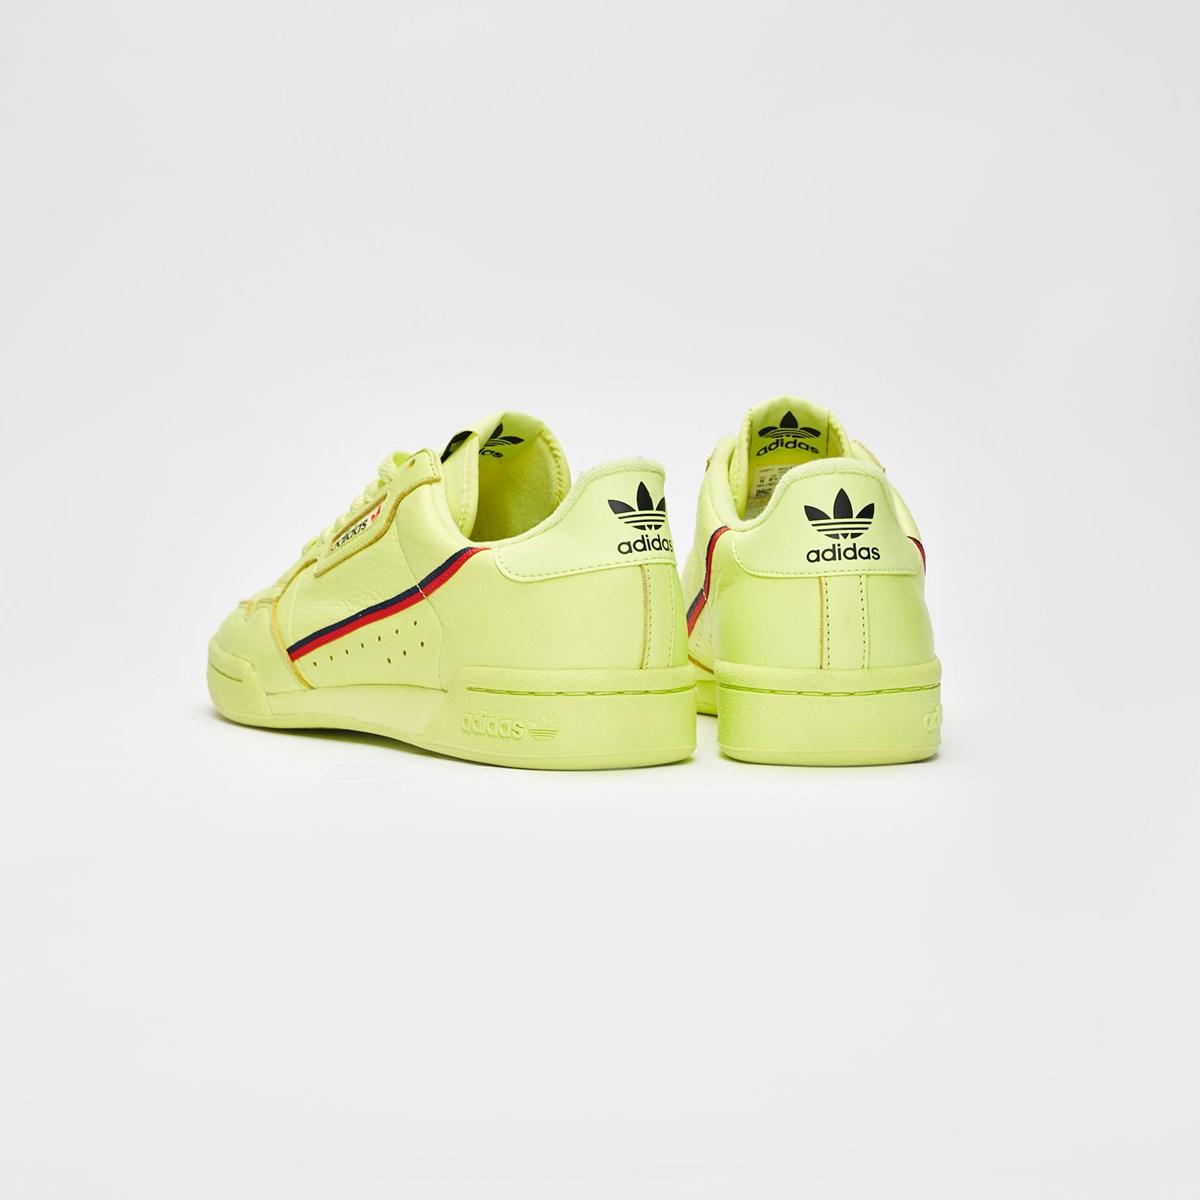 new style 9ad59 bd487 adidas Continental 80 - B41675 - Sneakersnstuff  sneakers  streetwear  online since 1999